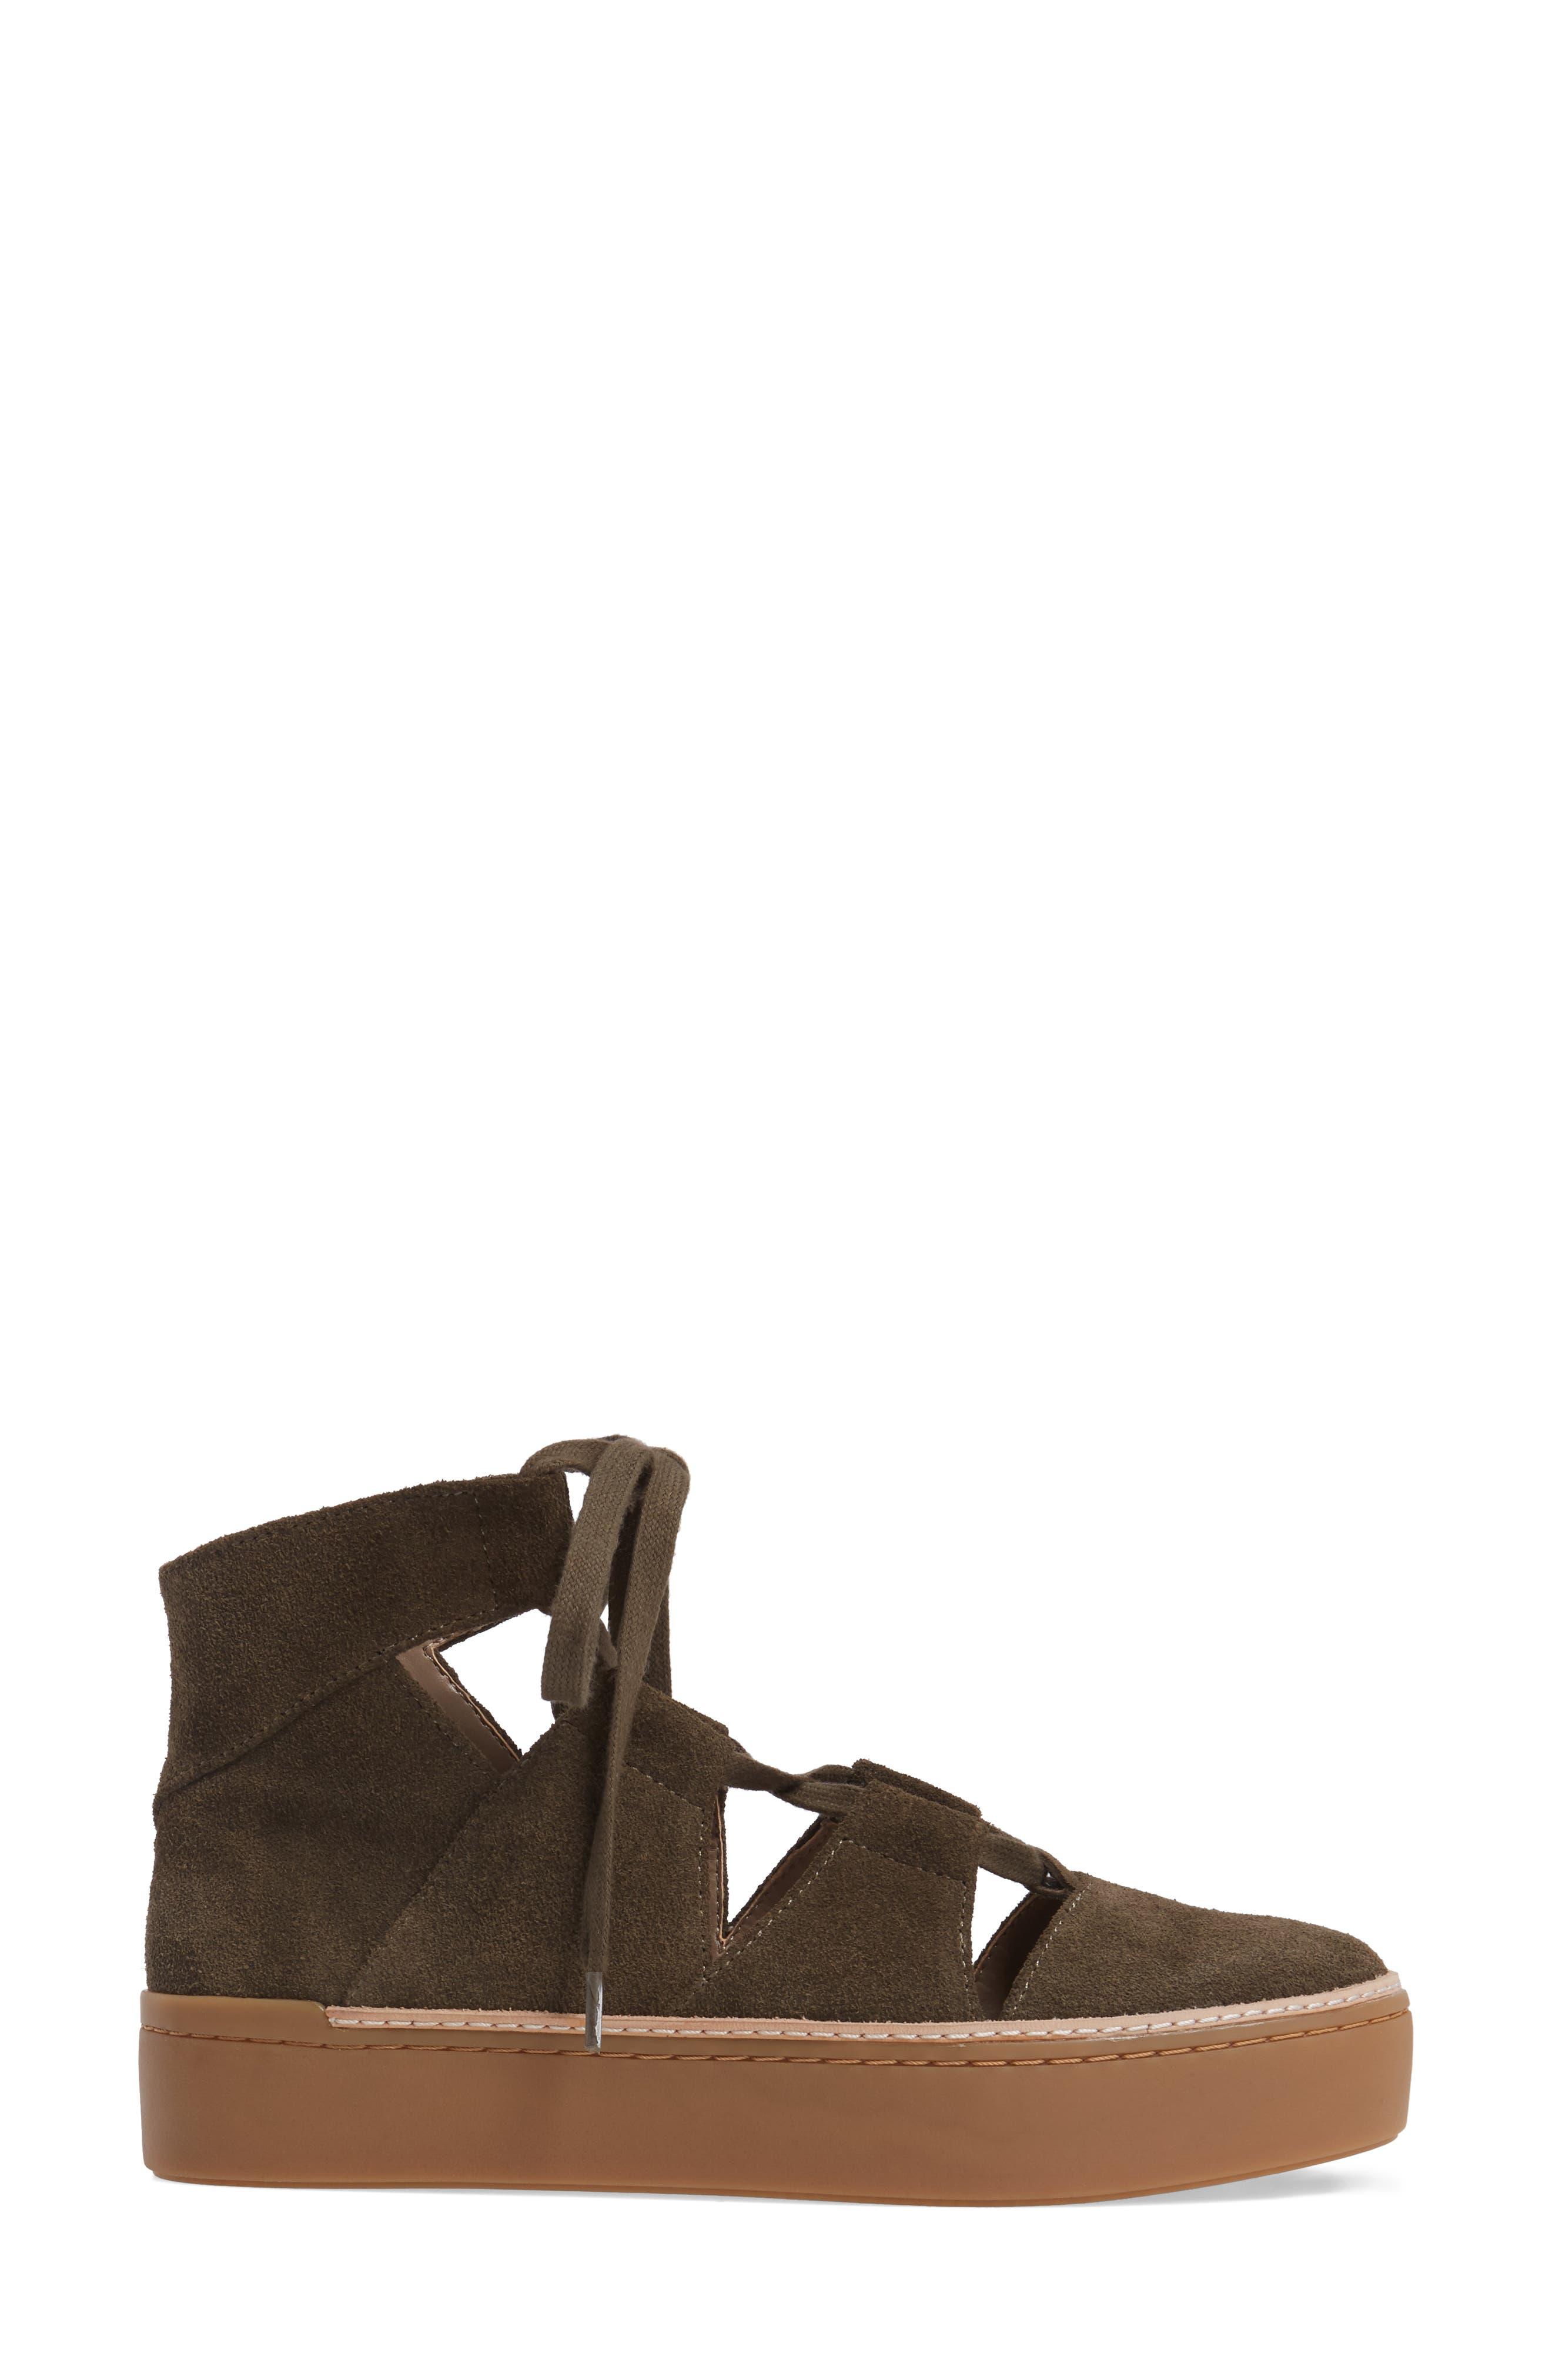 Alternate Image 3  - M4D3 Savanah Ghillie Platform Sneaker (Women)